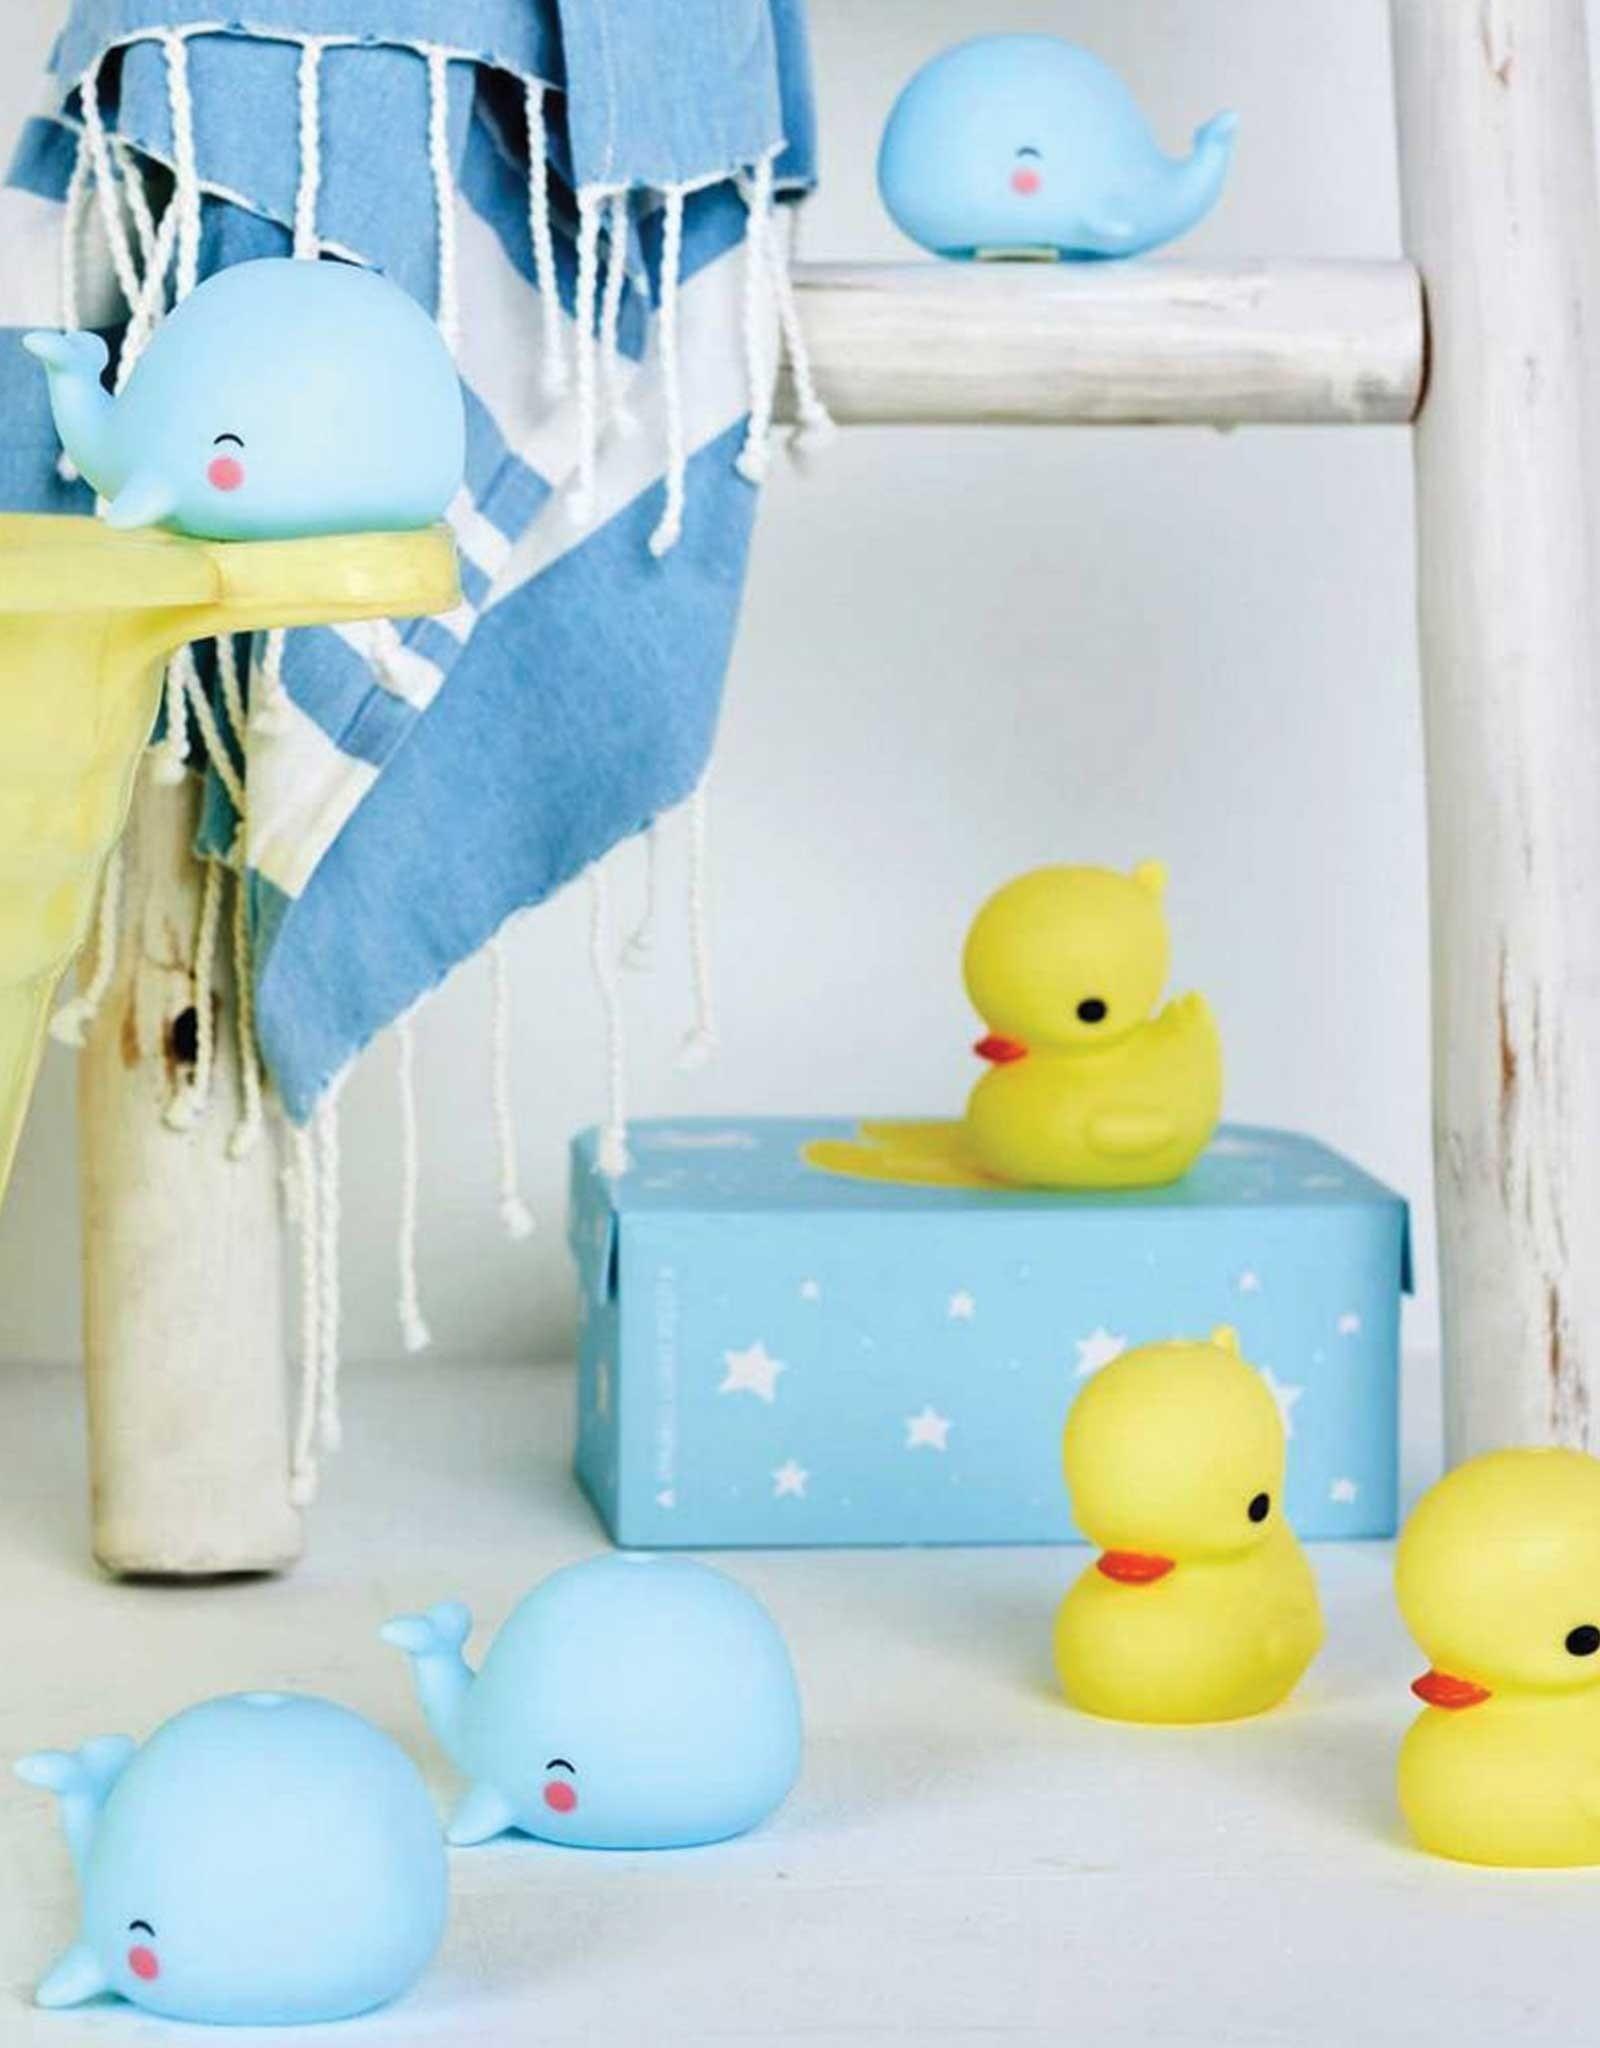 A Little Lovely Company Jouet de bain - Baleine